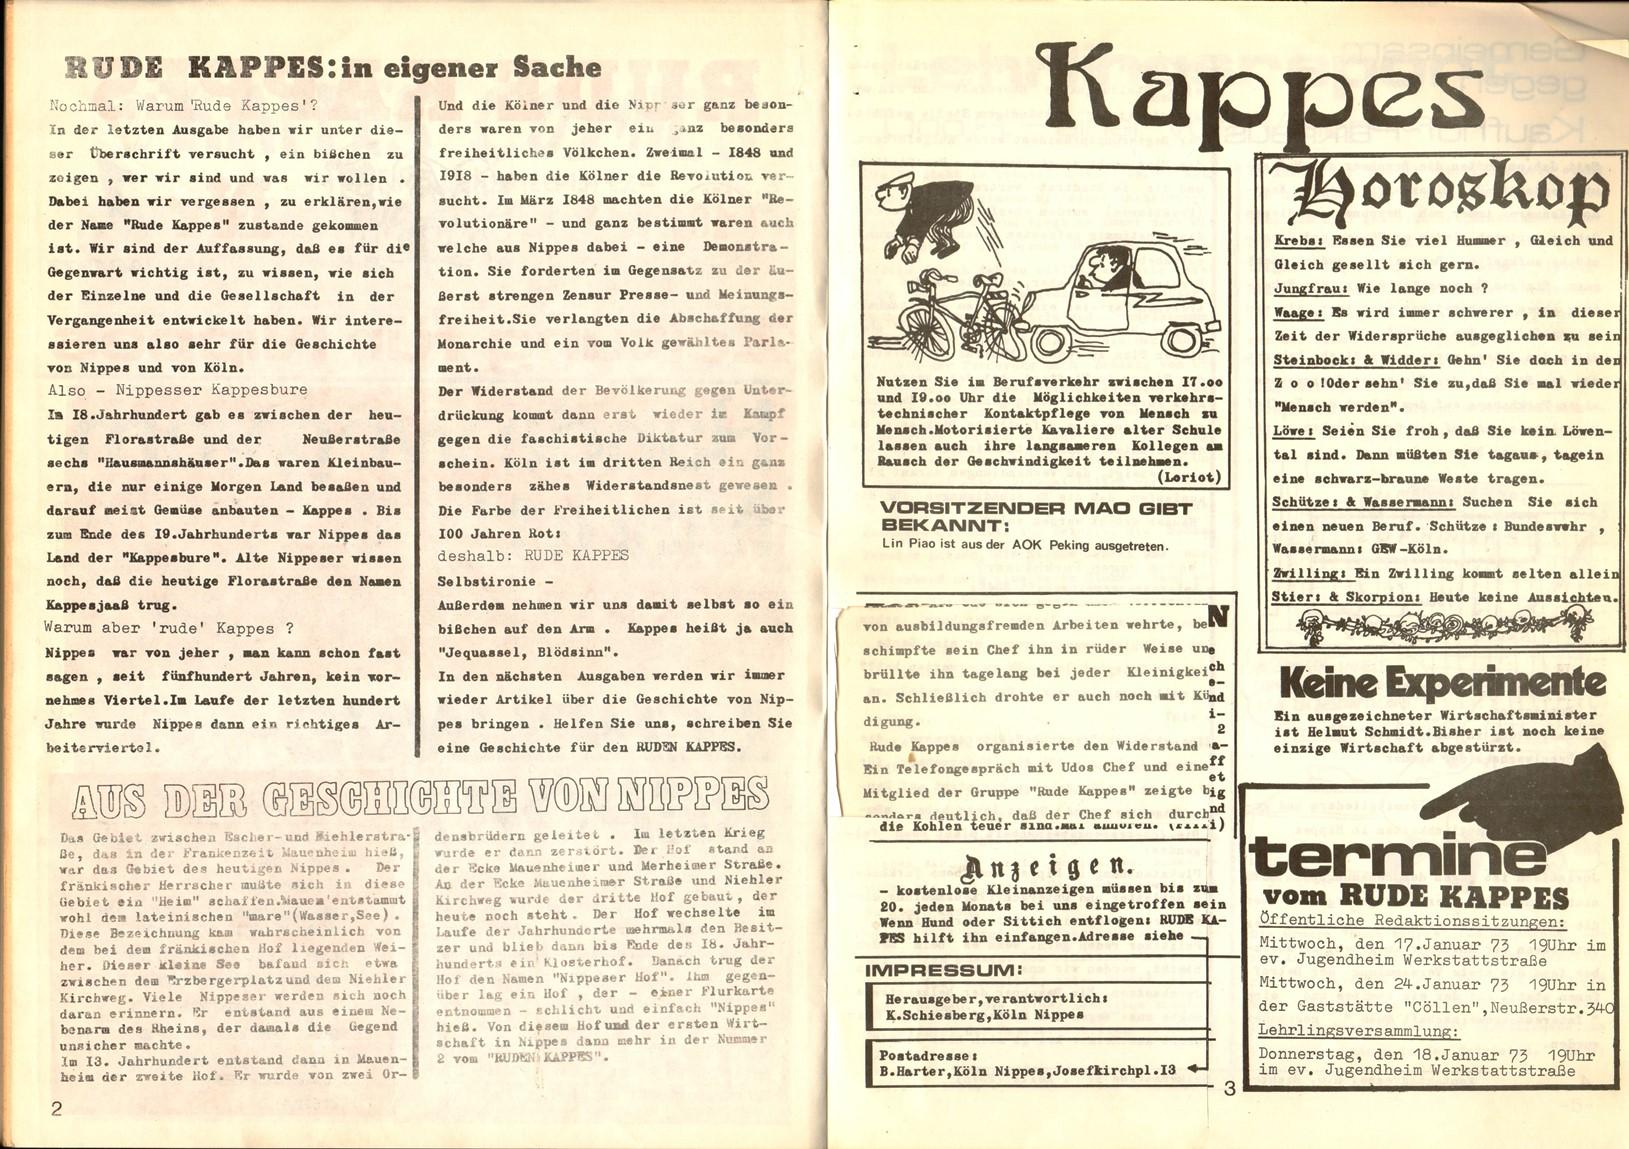 Koeln_Rude_Kappes_1973_01_02